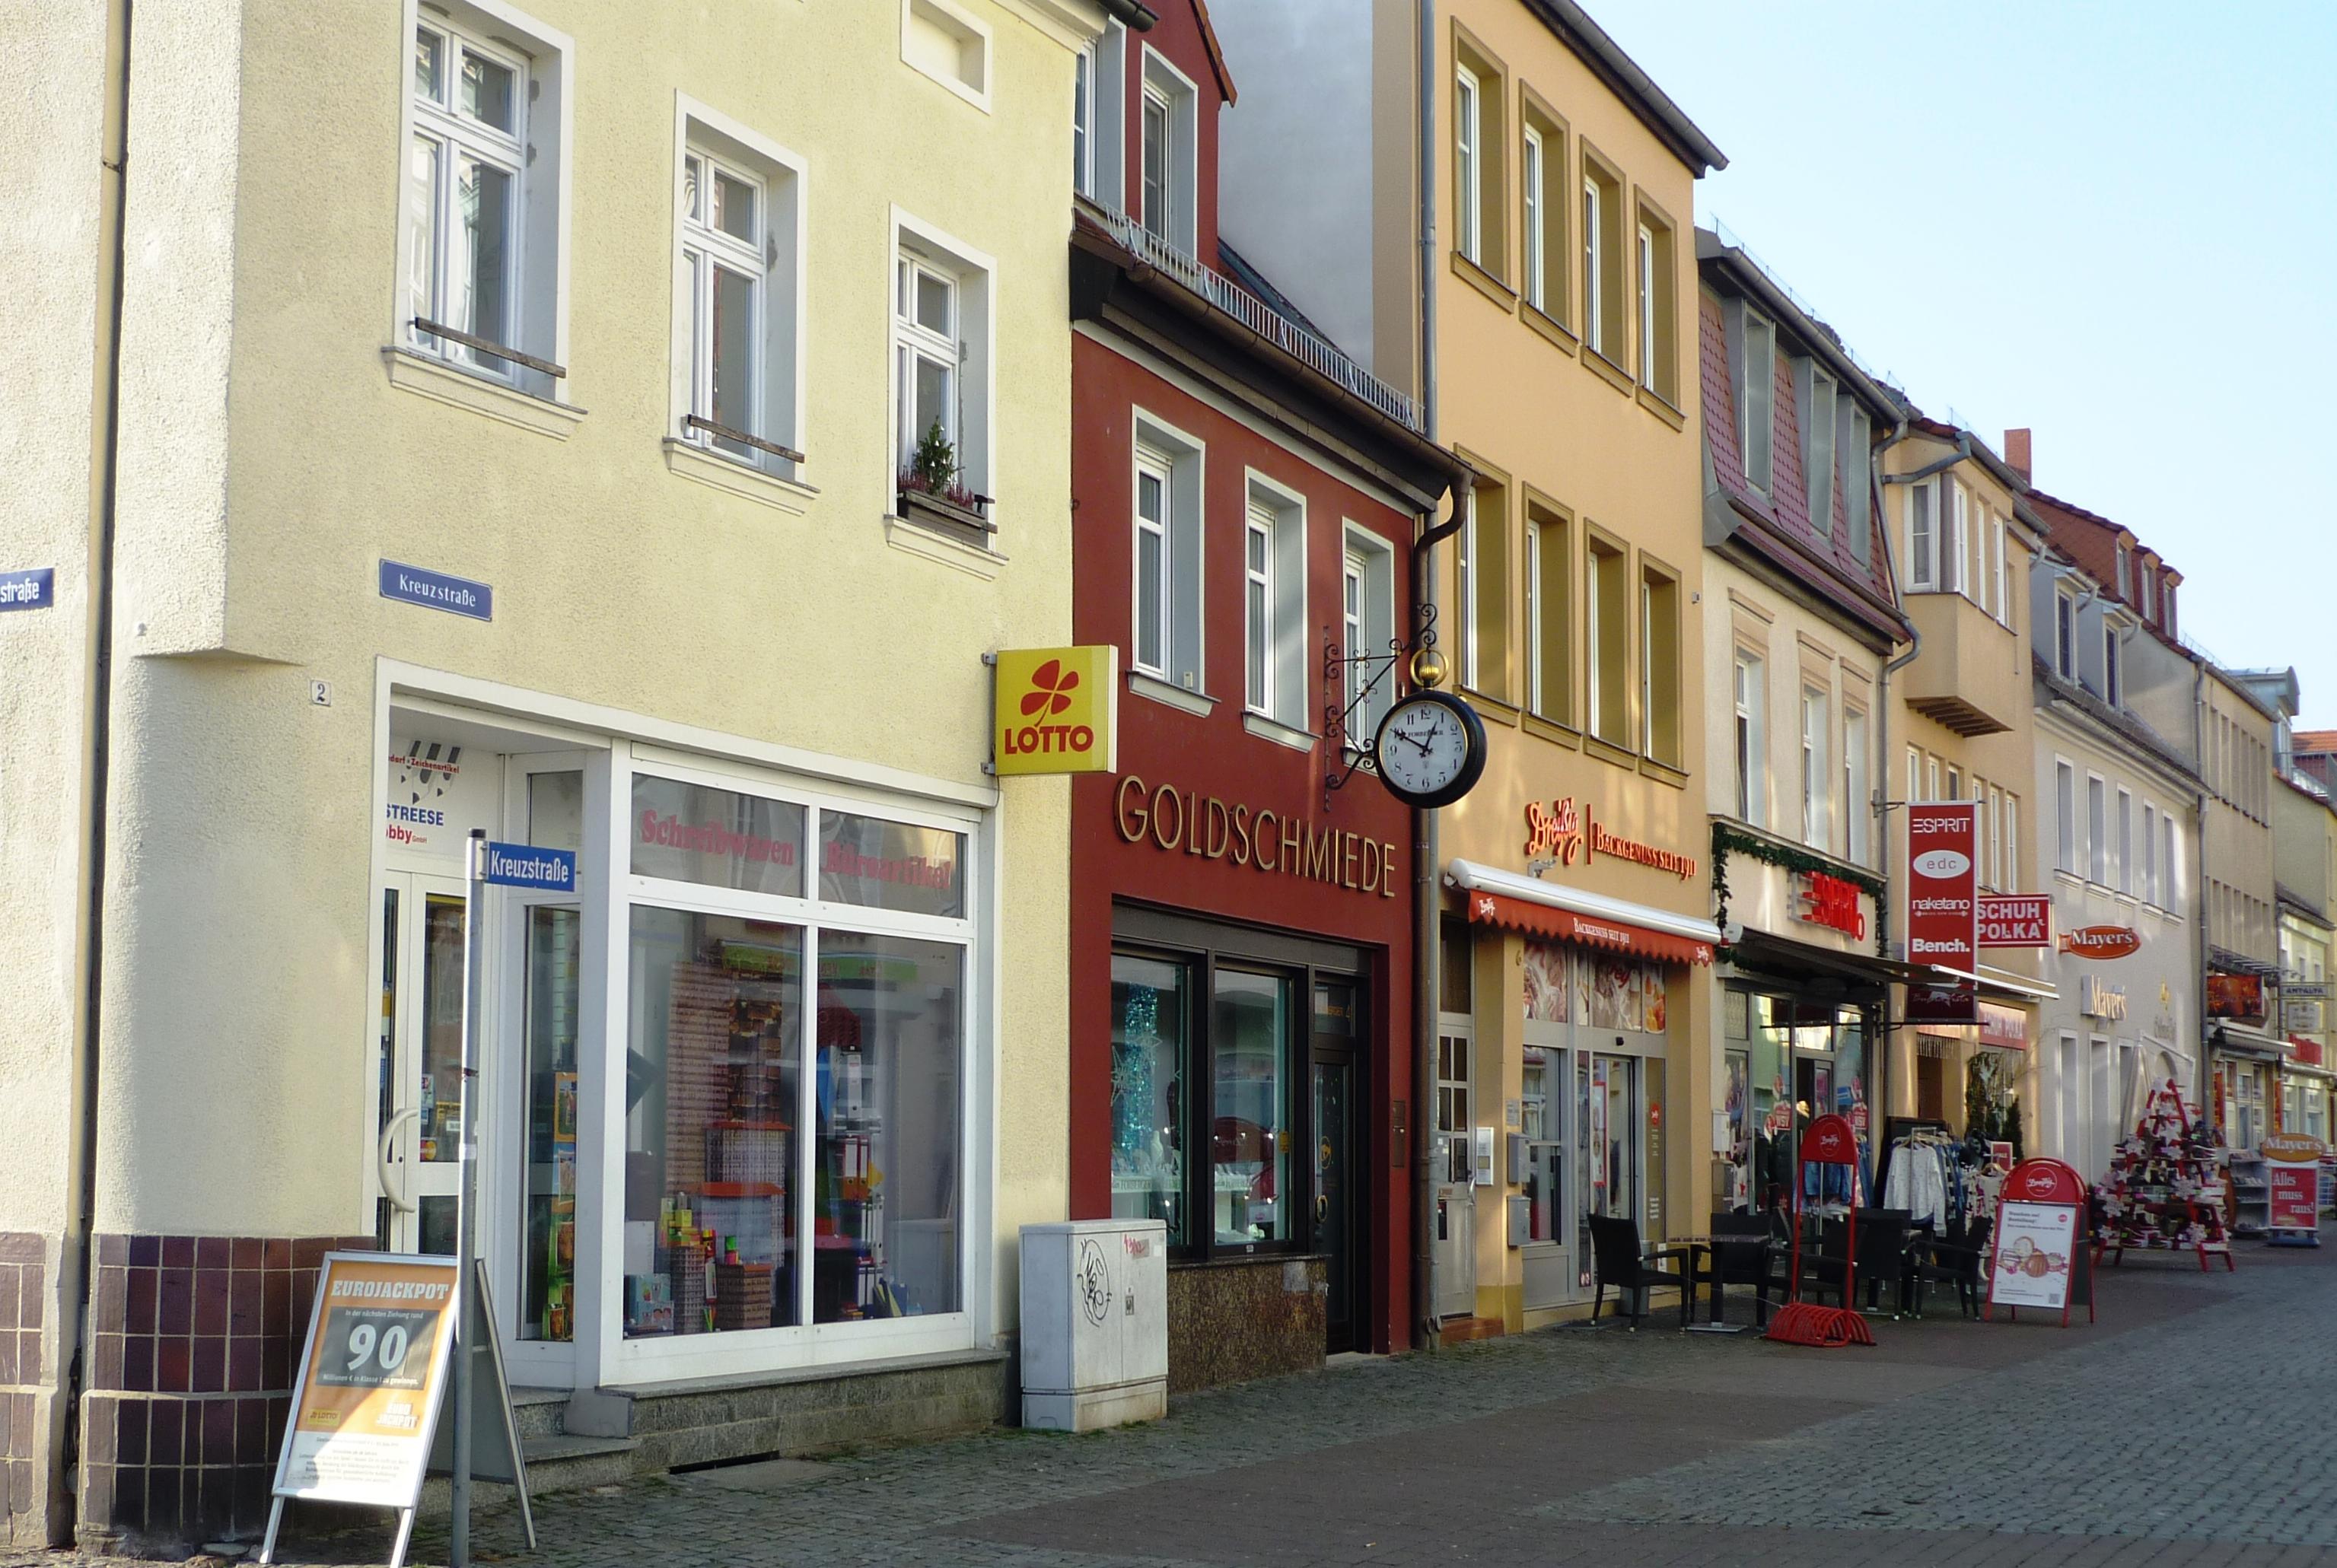 R. Schimpf, Büro & Hobby GmbH